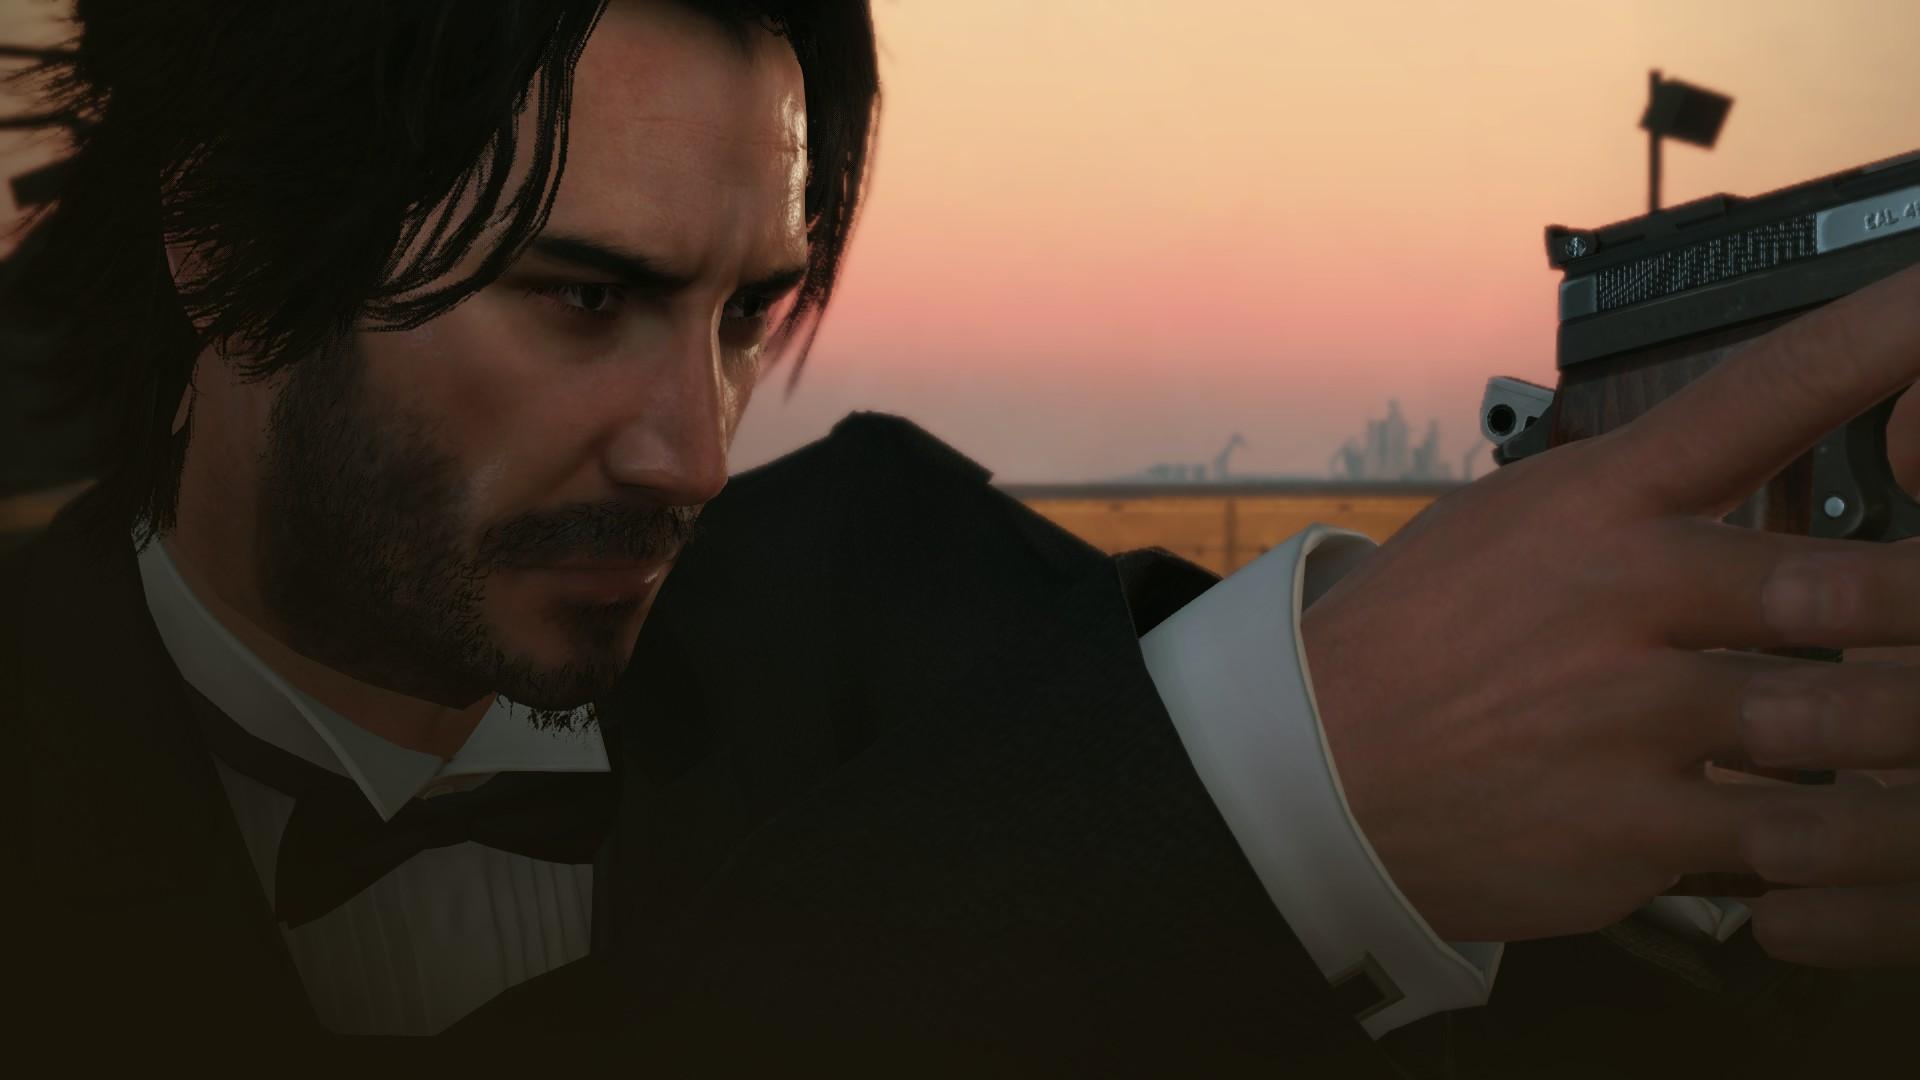 Keanu Reeves intégré dans Metal Gear Solid V via un mod